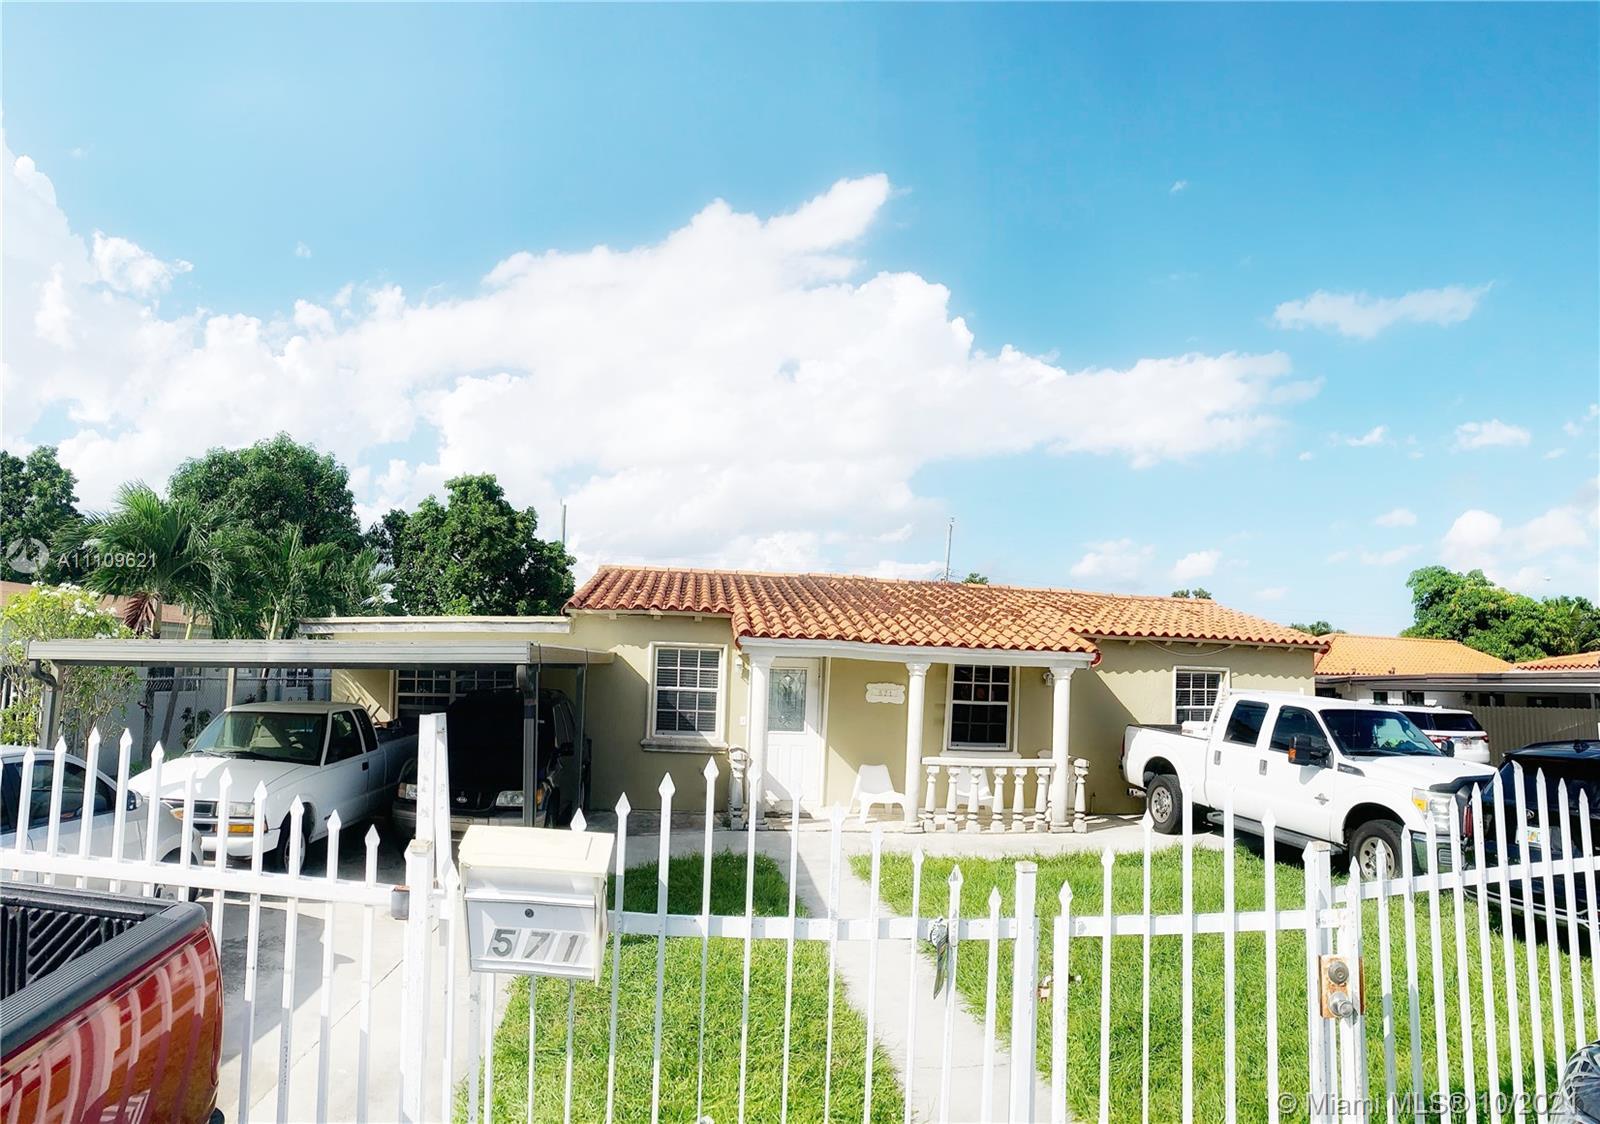 Single Family Home,For Sale,571 E 35th St, Hialeah, Florida 33013,Brickell,realty,broker,condos near me